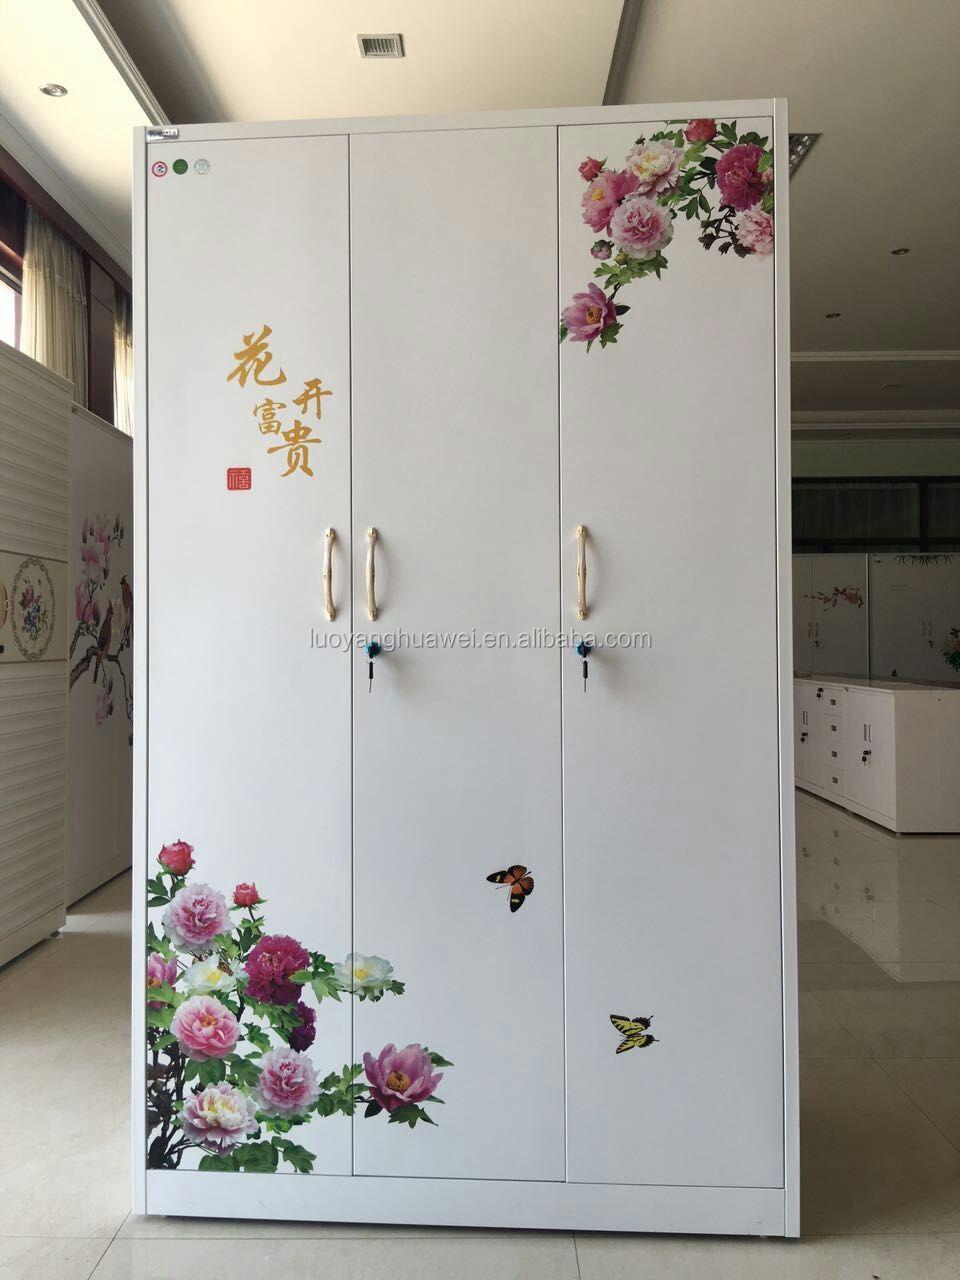 ... Cold Roll Steel Plate Living Room Furniture Closet Wardrobe / Kids  Metal Almirah Design